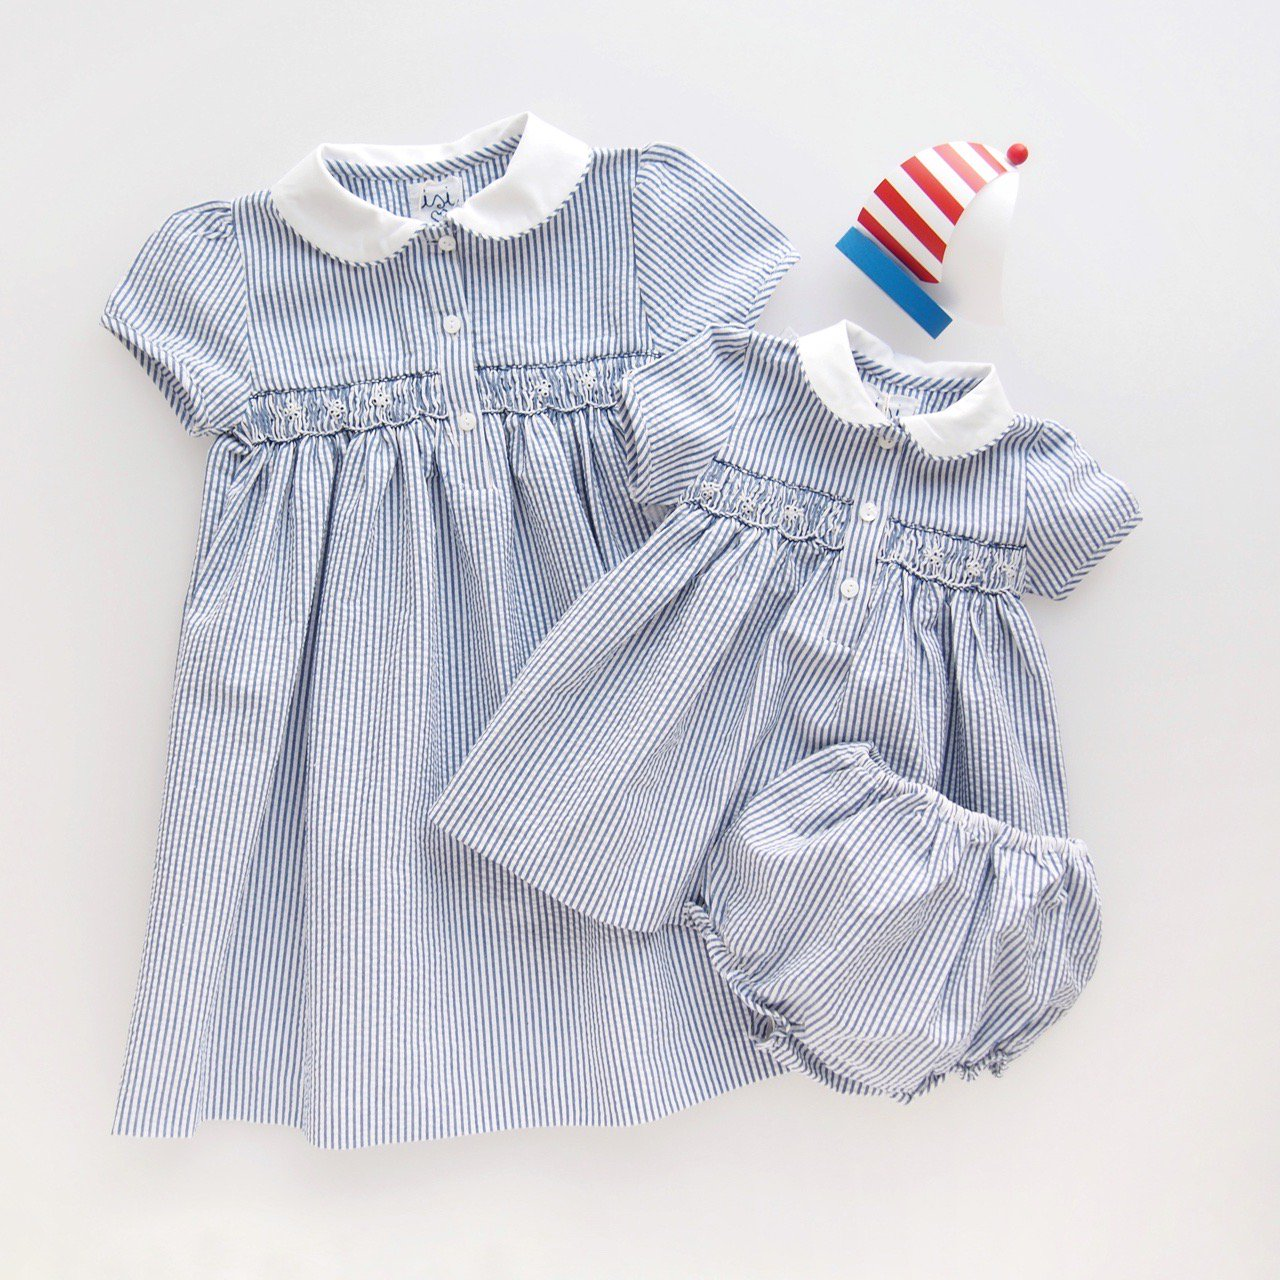 <img class='new_mark_img1' src='https://img.shop-pro.jp/img/new/icons1.gif' style='border:none;display:inline;margin:0px;padding:0px;width:auto;' />Malvi&Co.(ISI) - Stripes smocked dress